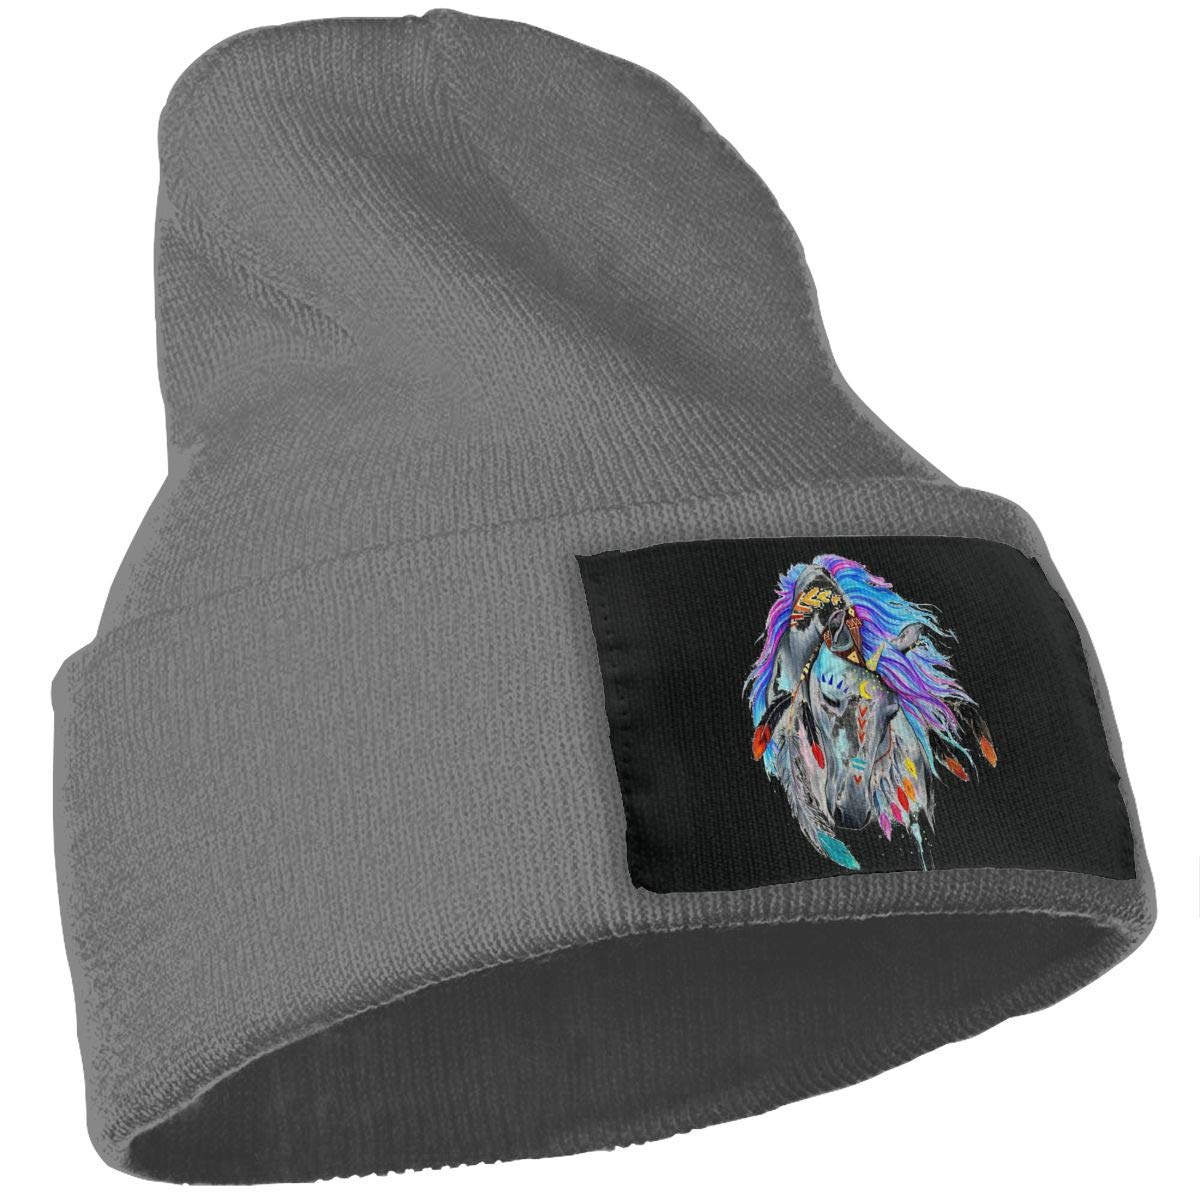 Color National Wind Horse Warm Winter Hat Knit Beanie Skull Cap Cuff Beanie Hat Winter Hats for Men /& Women